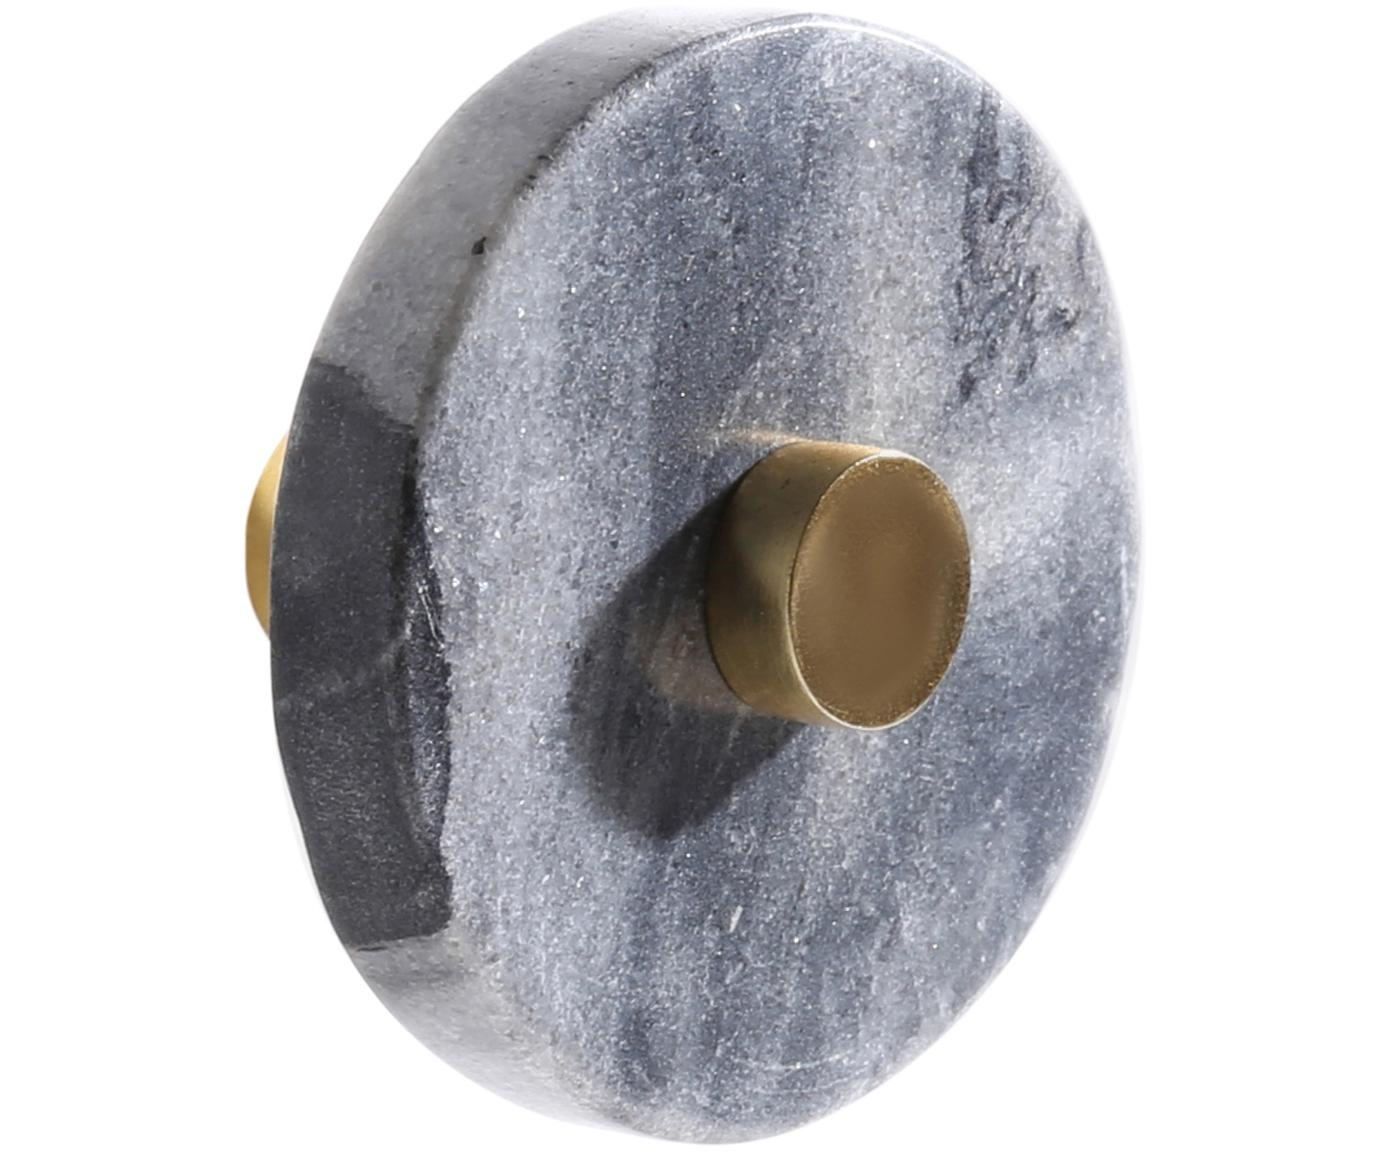 Colgador de mármol Jona, Fijación: latón, Gris veteado, latón, Ø 5 x F 8 cm